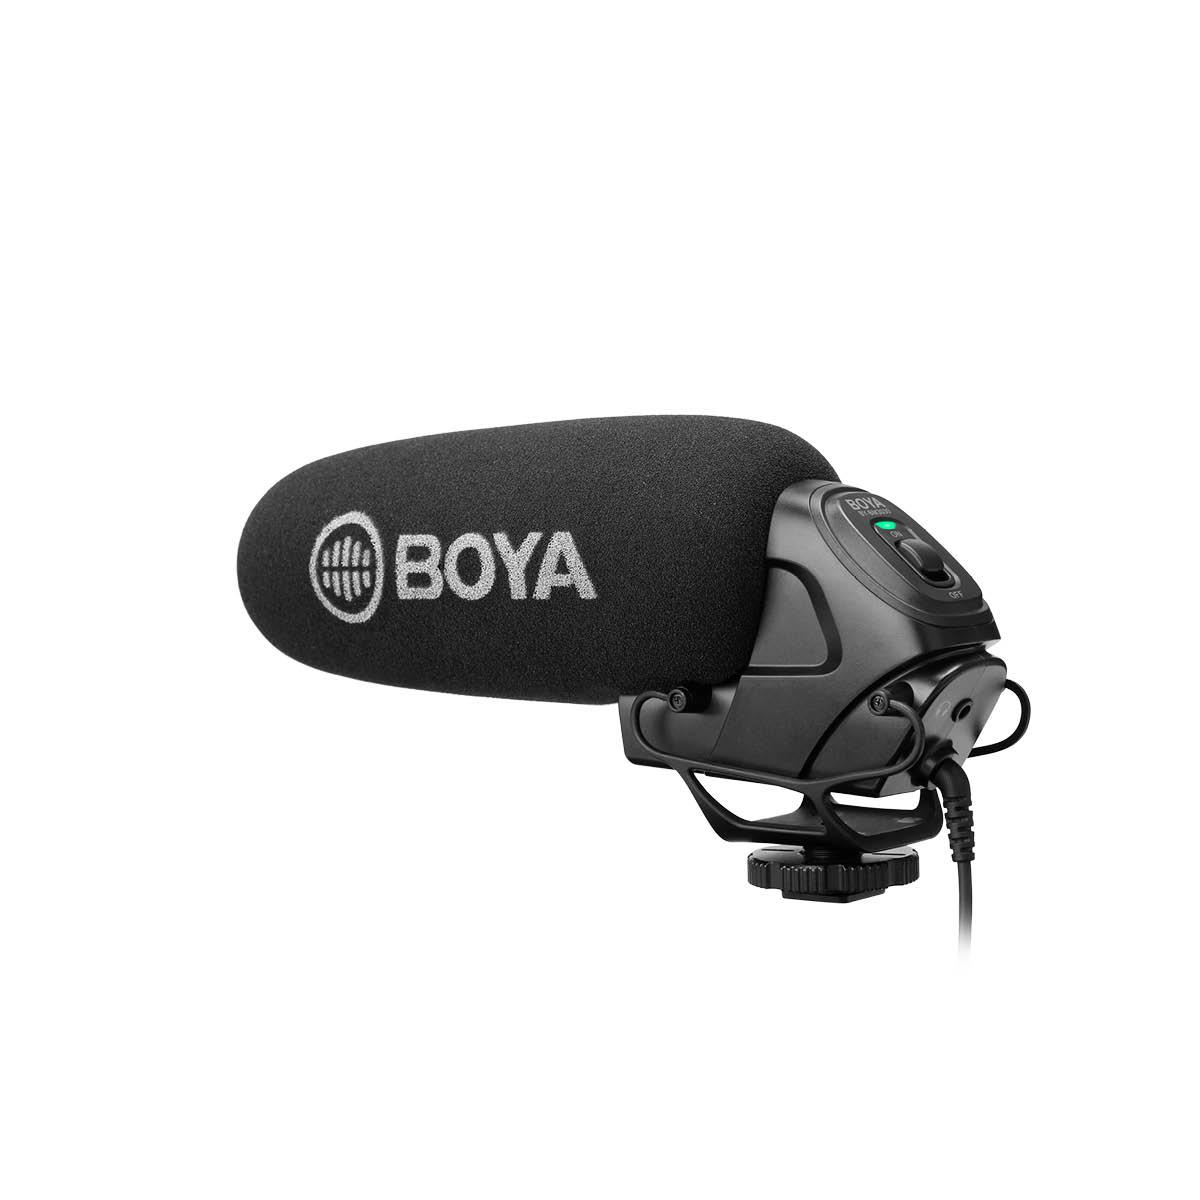 Boya BM-3030 Kondensator-Richtmikrofon